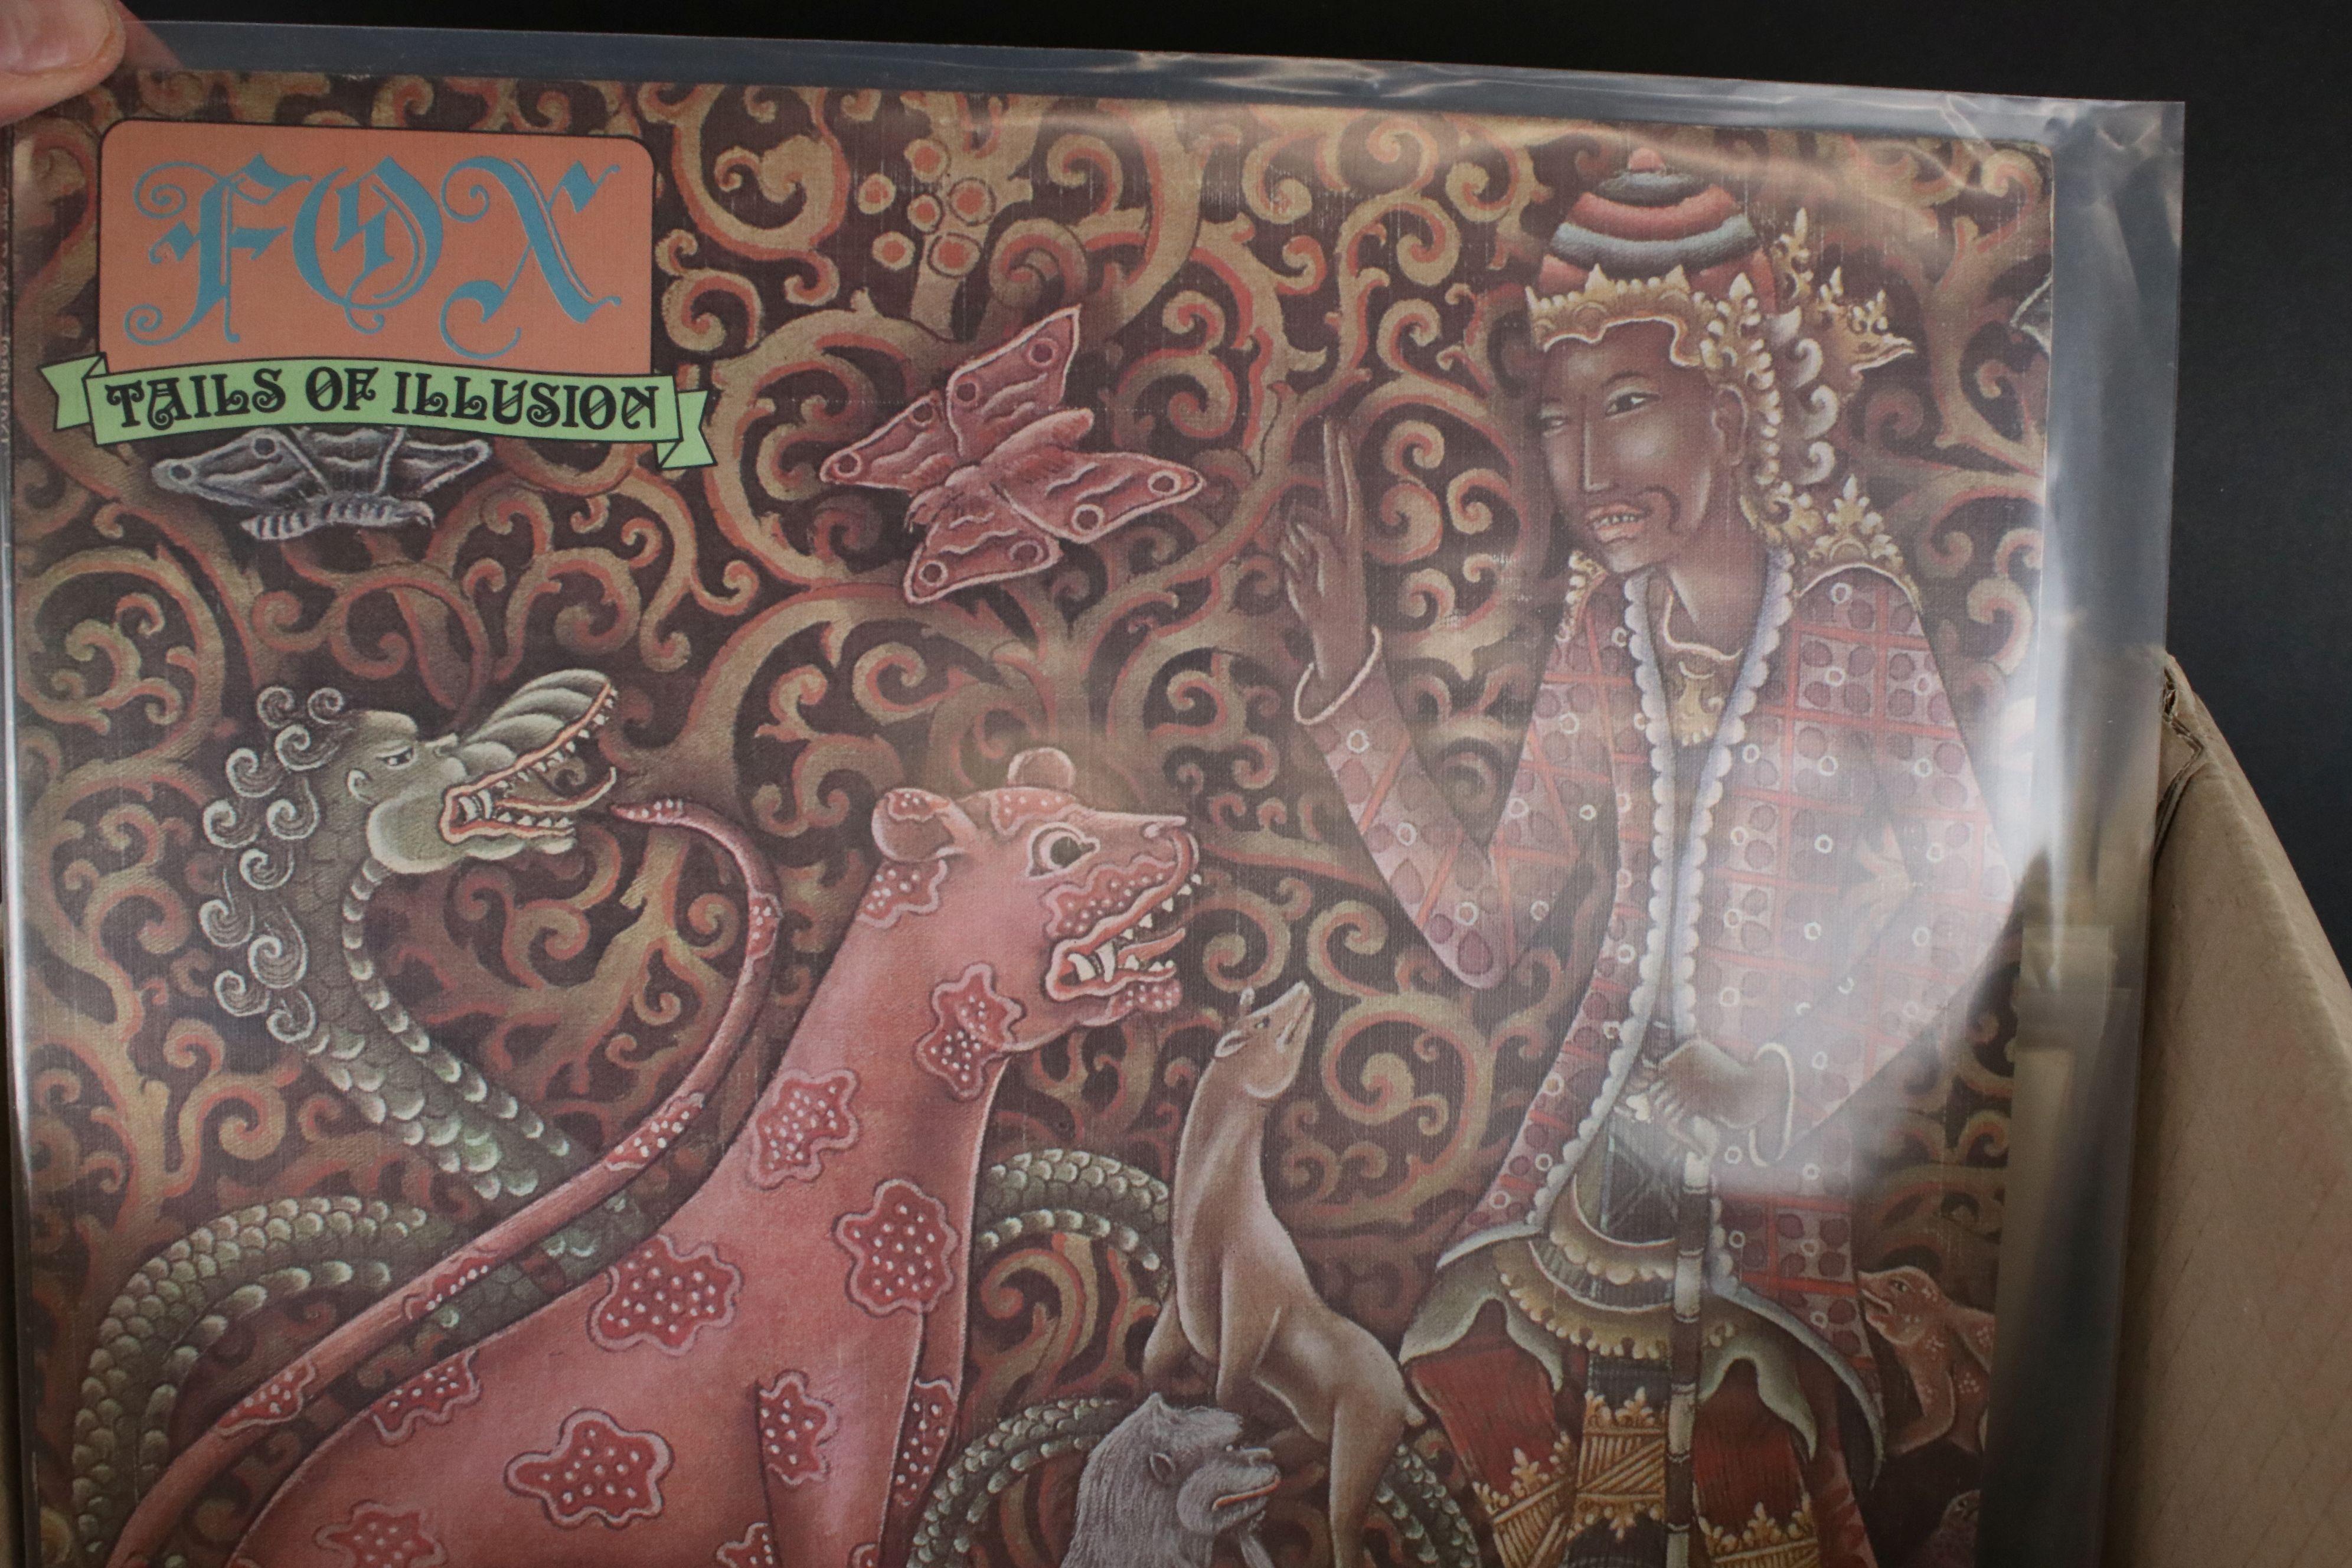 Vinyl - Around 30 Folk LPs to include The Strawbs, Pentangle, Richard & Linda Thompson, Fairport - Image 8 of 11